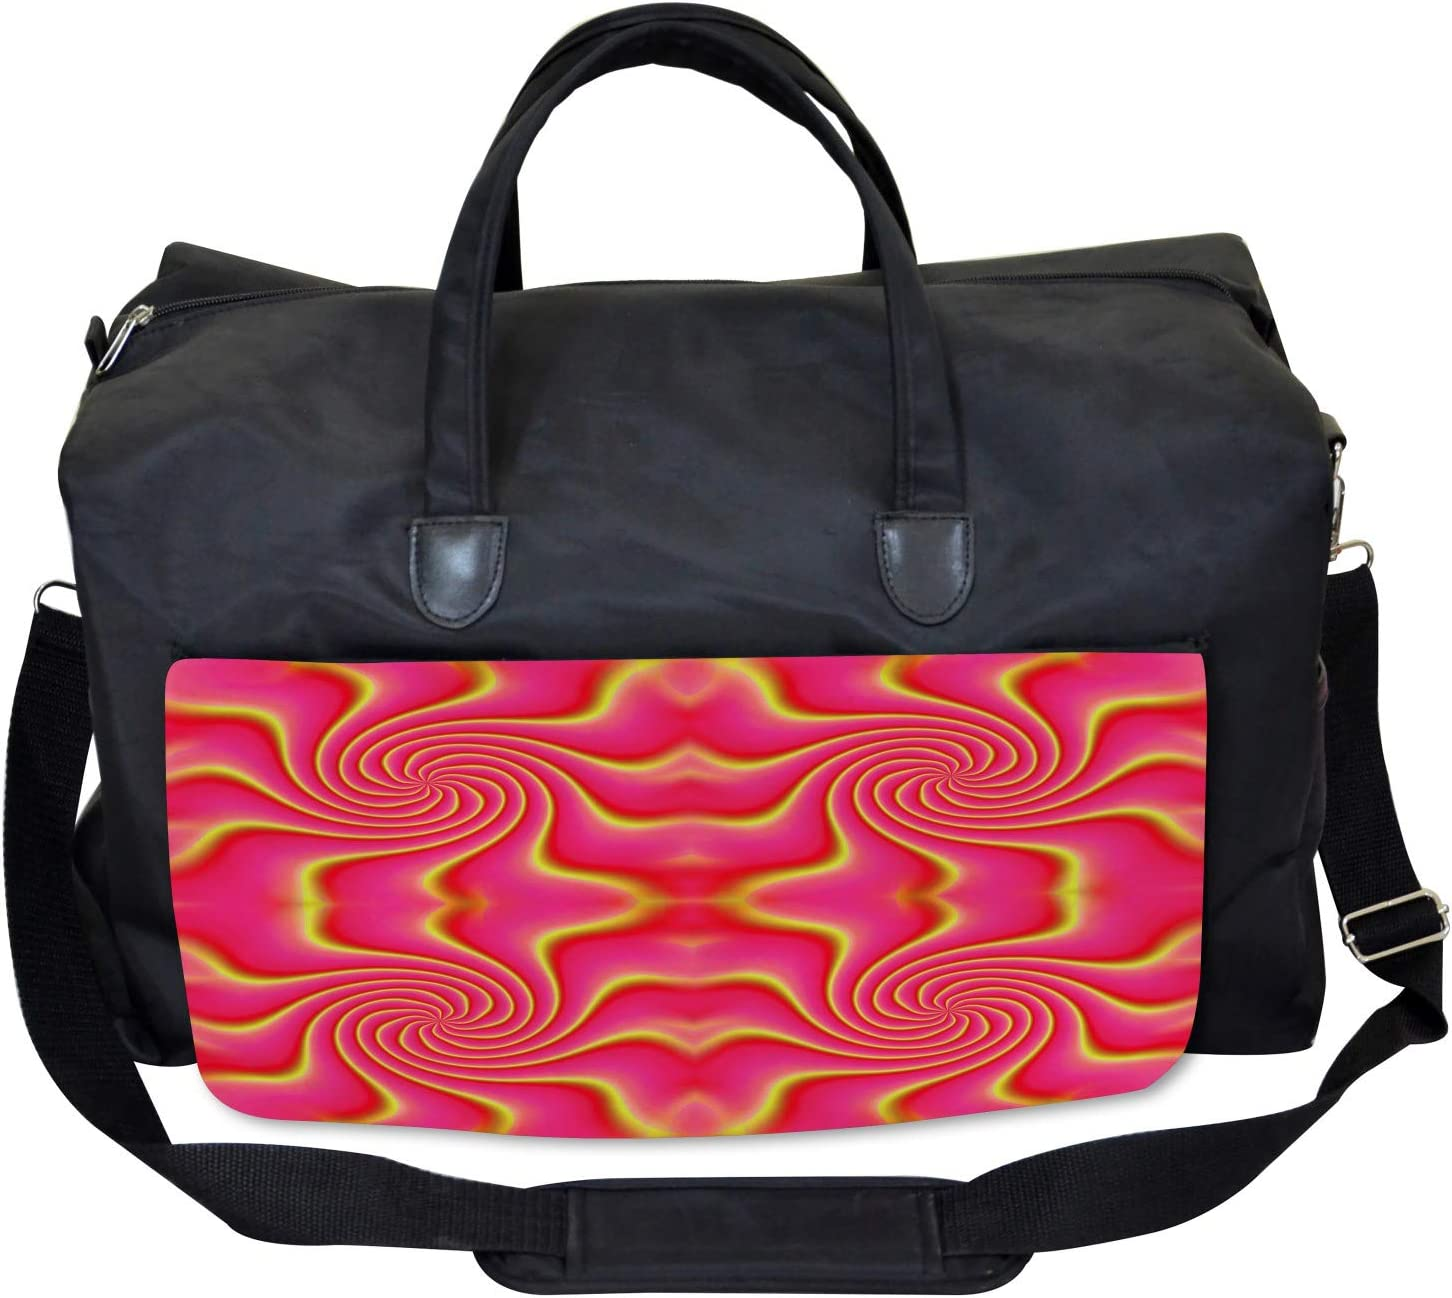 Large Weekender Carry-on Ambesonne Pink Gym Bag Surreal Patterns